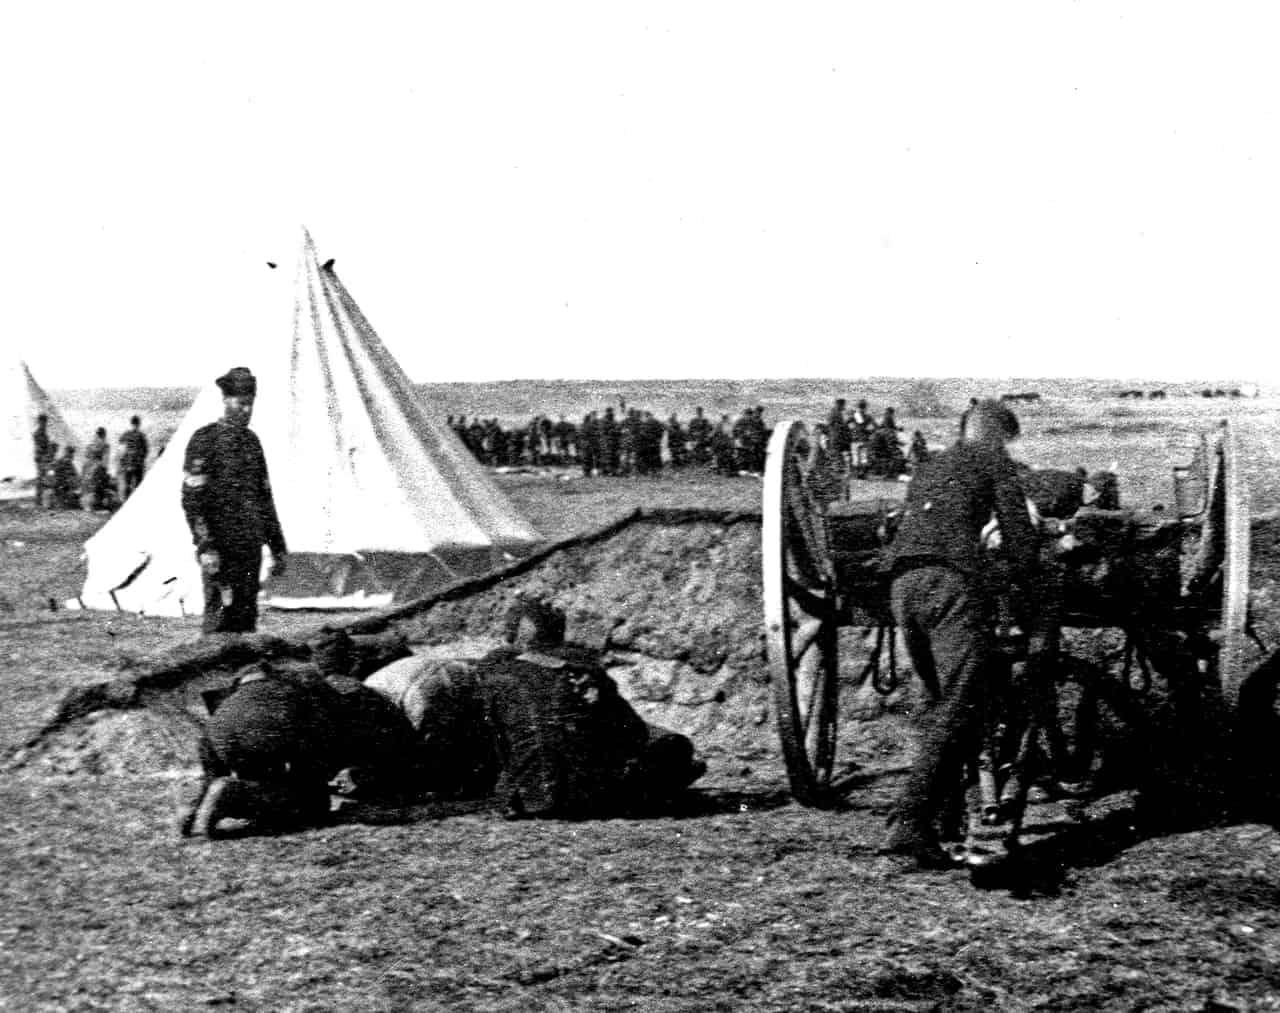 1885-Gun-Pit-A-Bty-Fish-Creek-Shilo-Stag